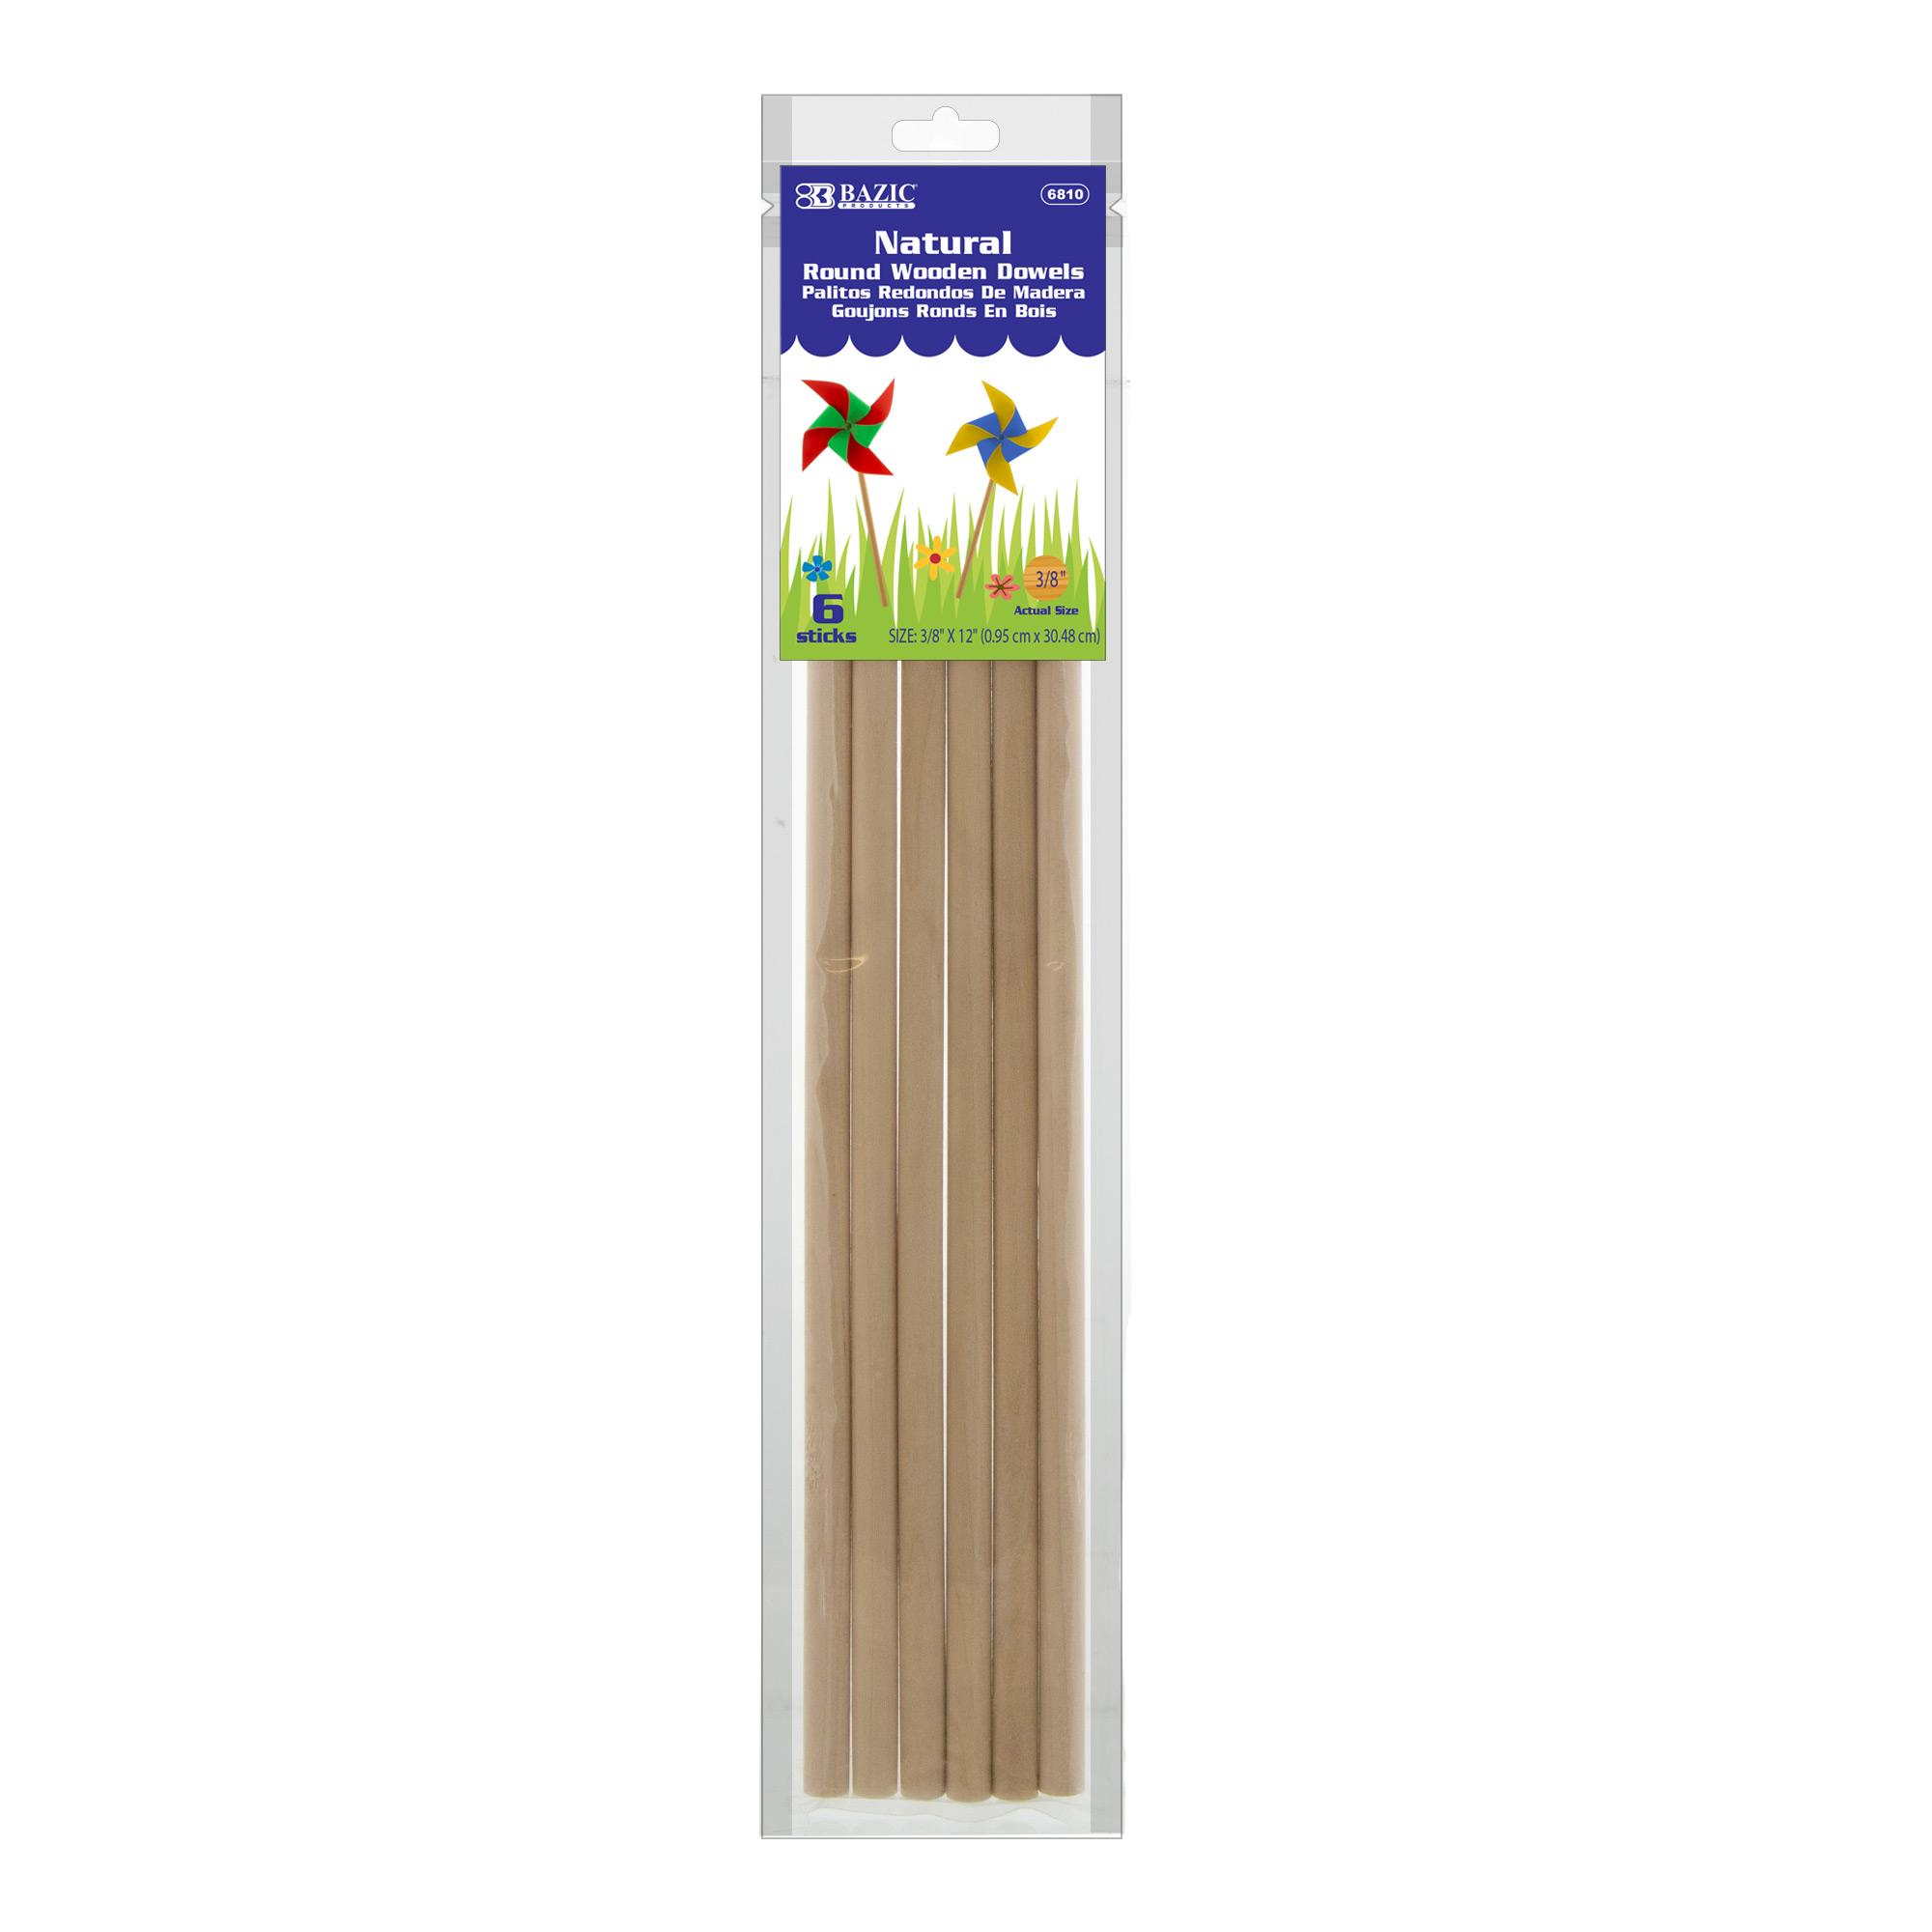 Wooden Dowel Round Natural 3/8″ x 12″ (6/Bag)